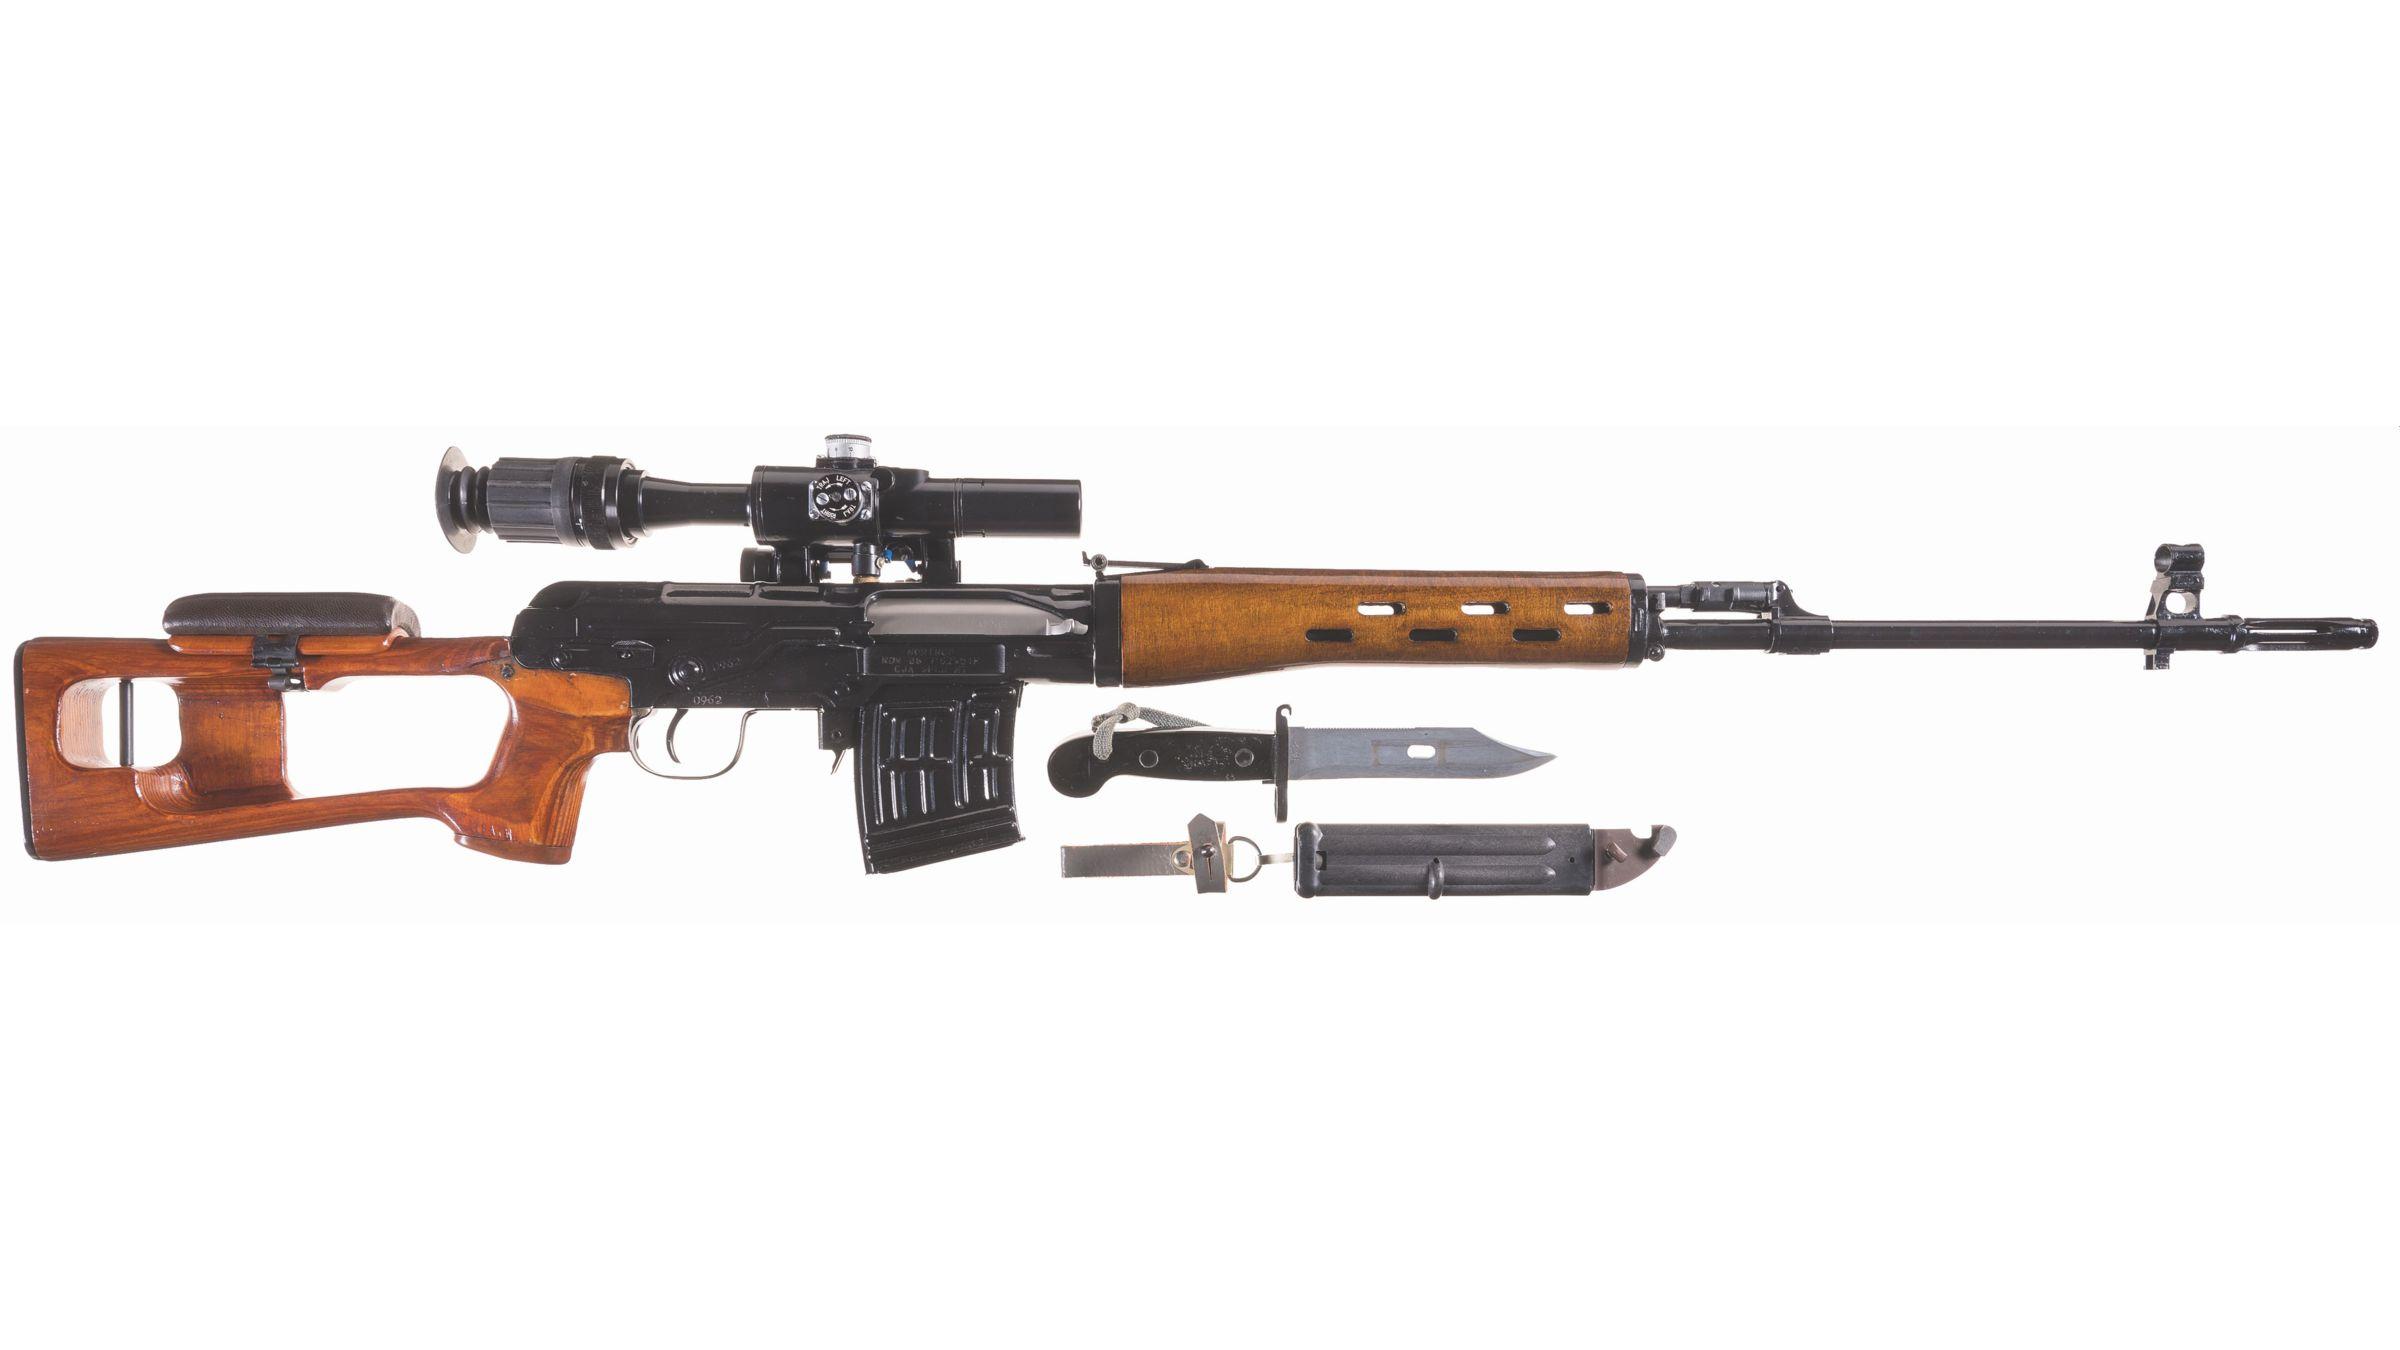 Norinco Ndm 86 Dragunov Sniper Rifle With Scope Accessories